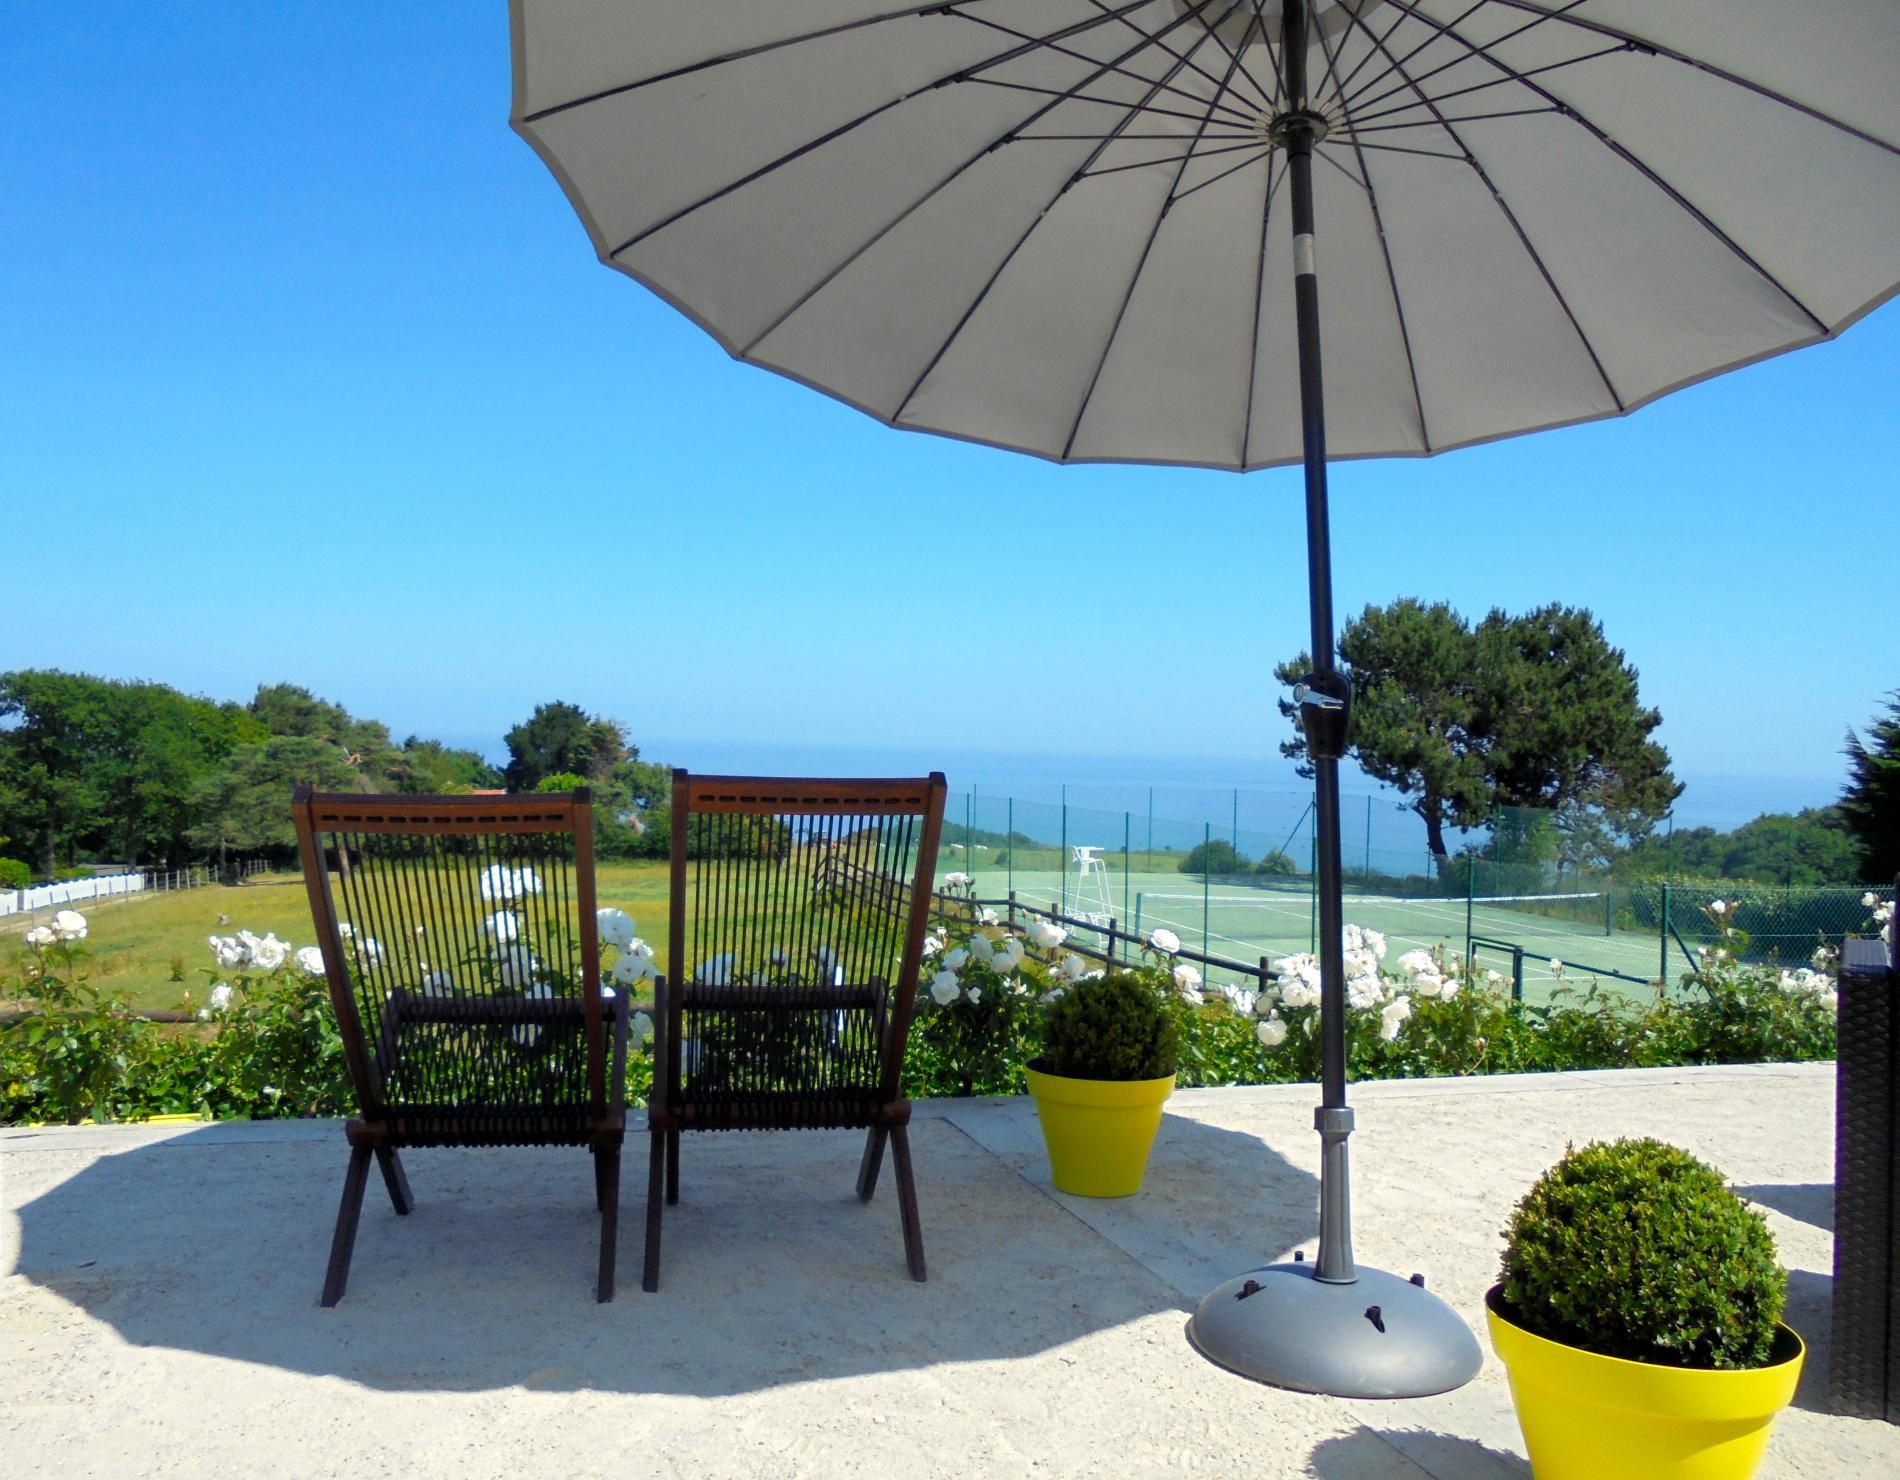 Hotel La Terrasse - Hotel de charme en Normandie